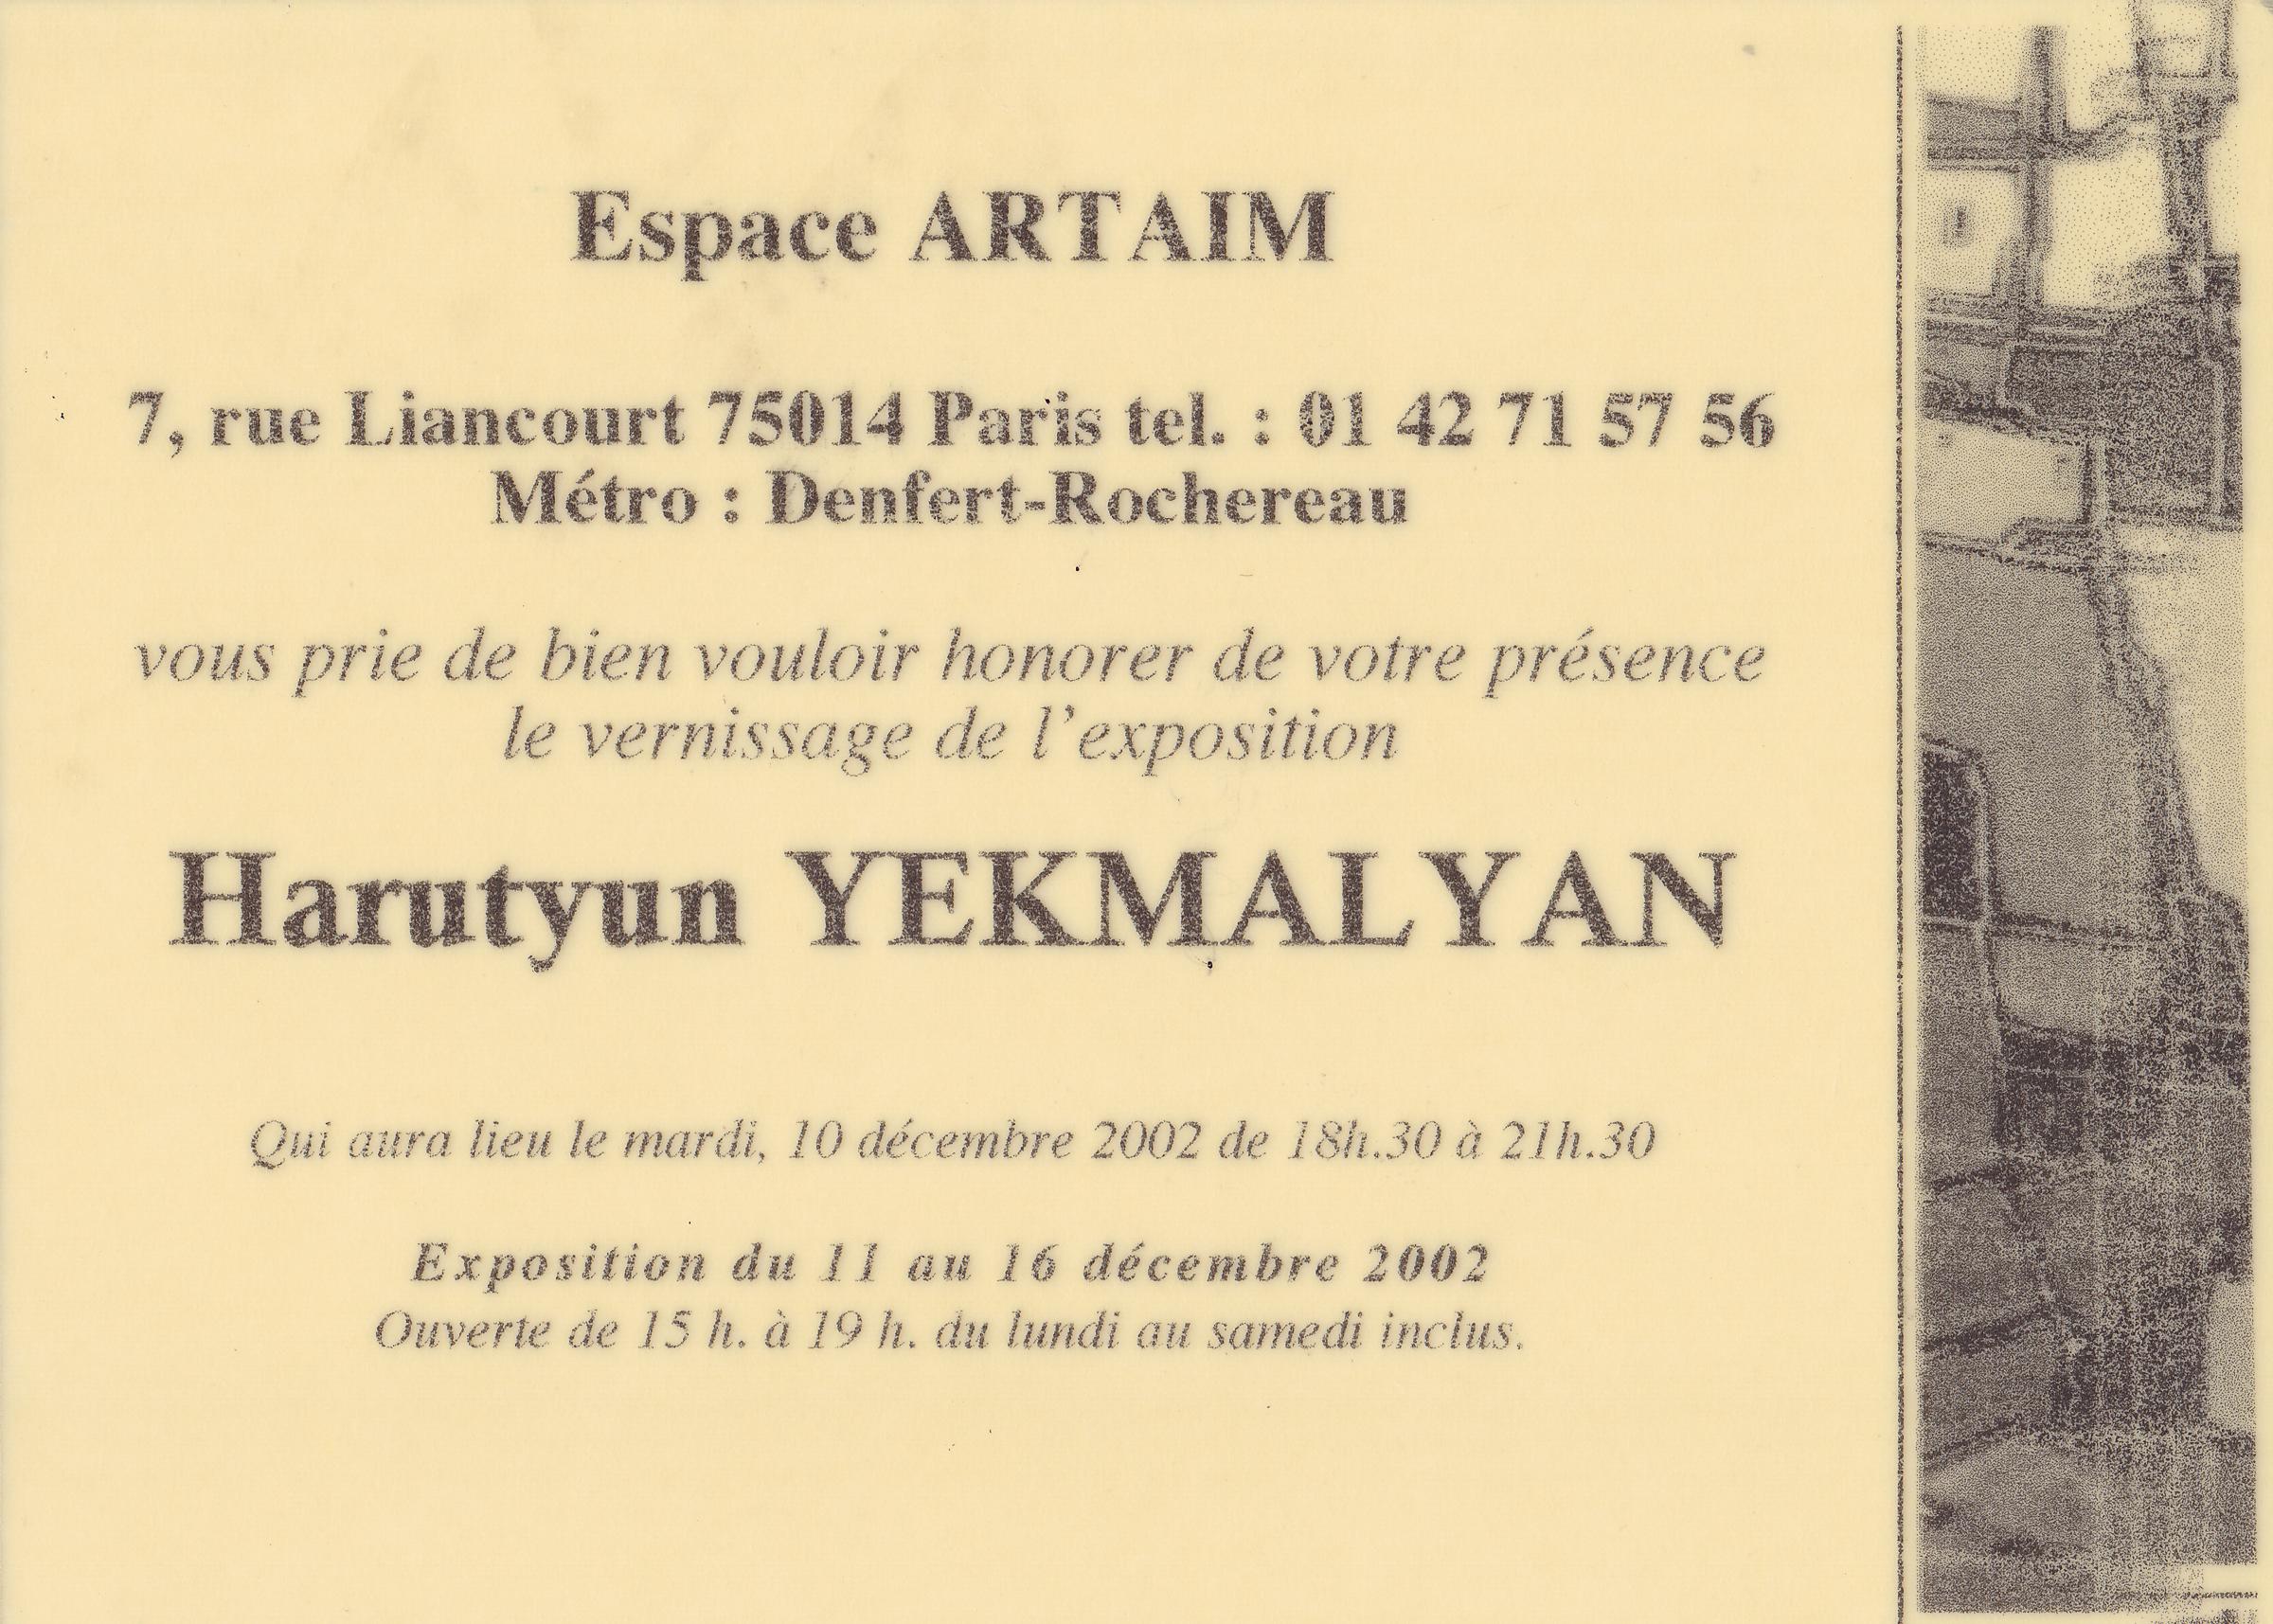 association artaim expo grid-21.jpg